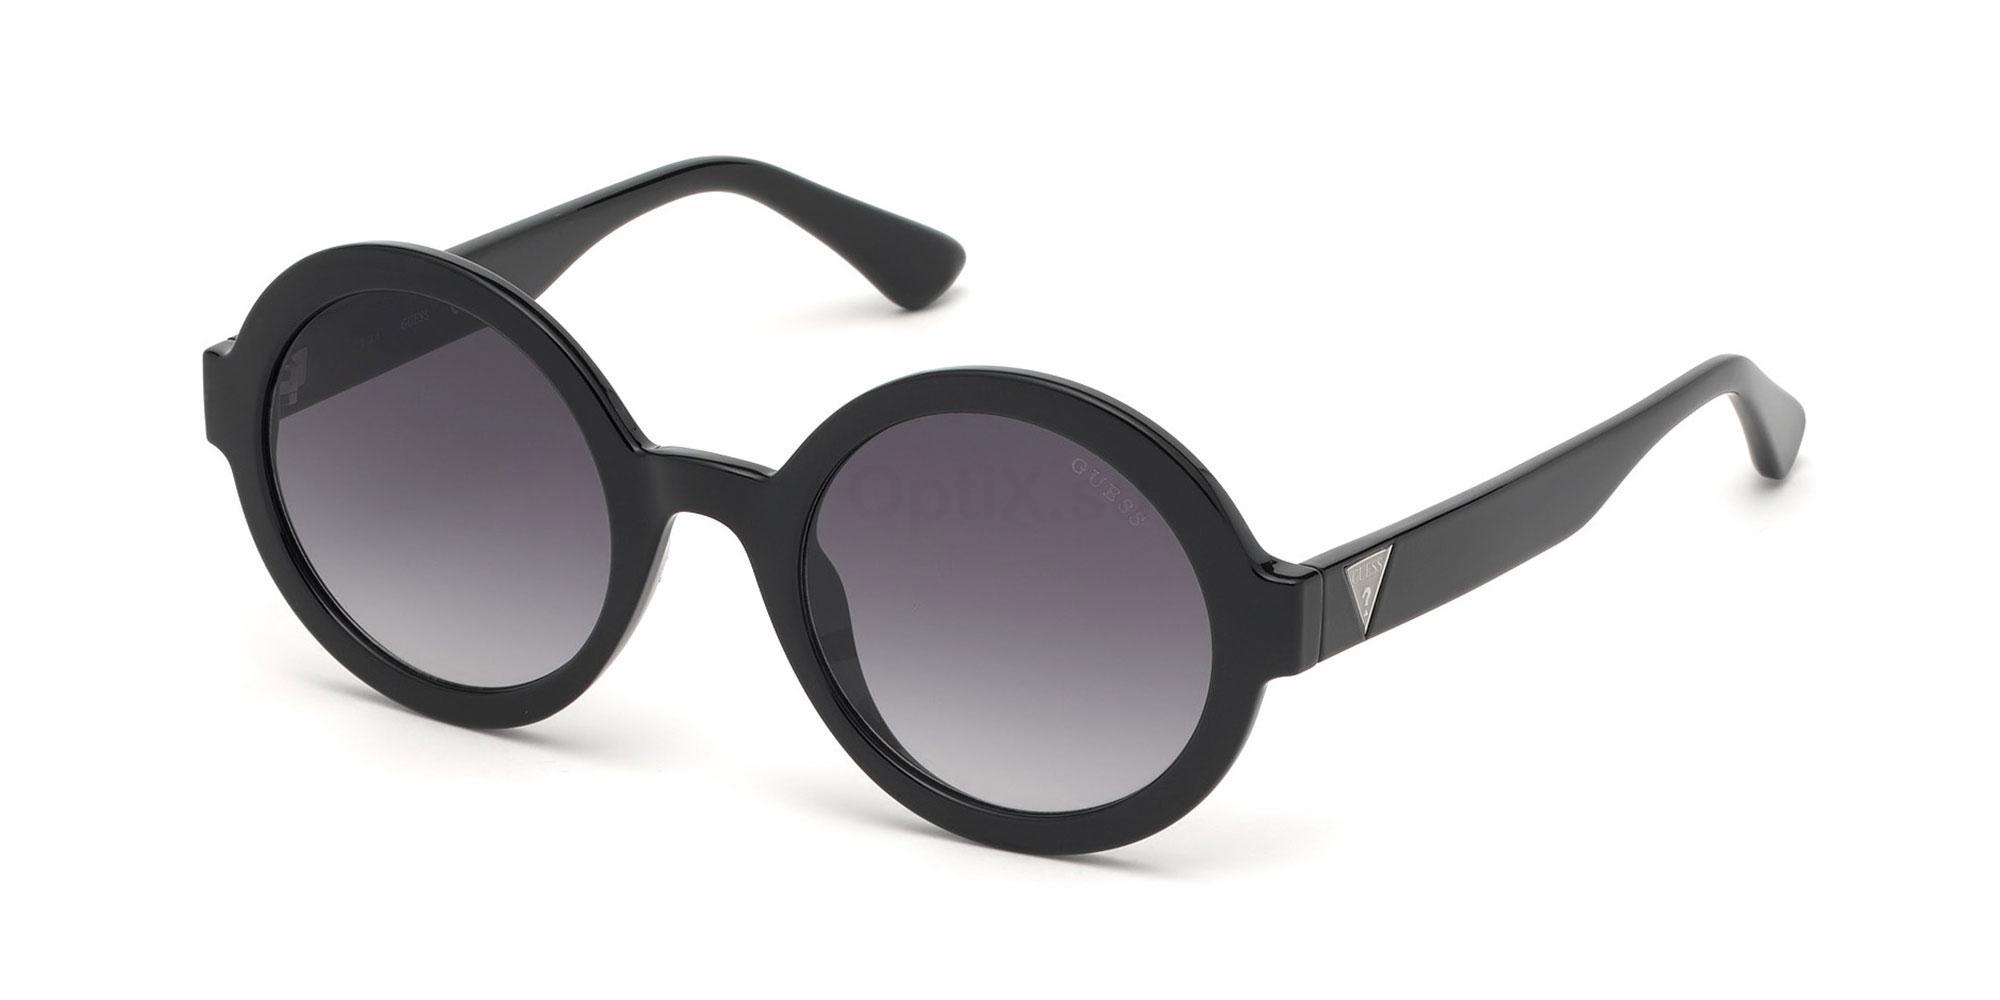 01B GU7613 Sunglasses, Guess